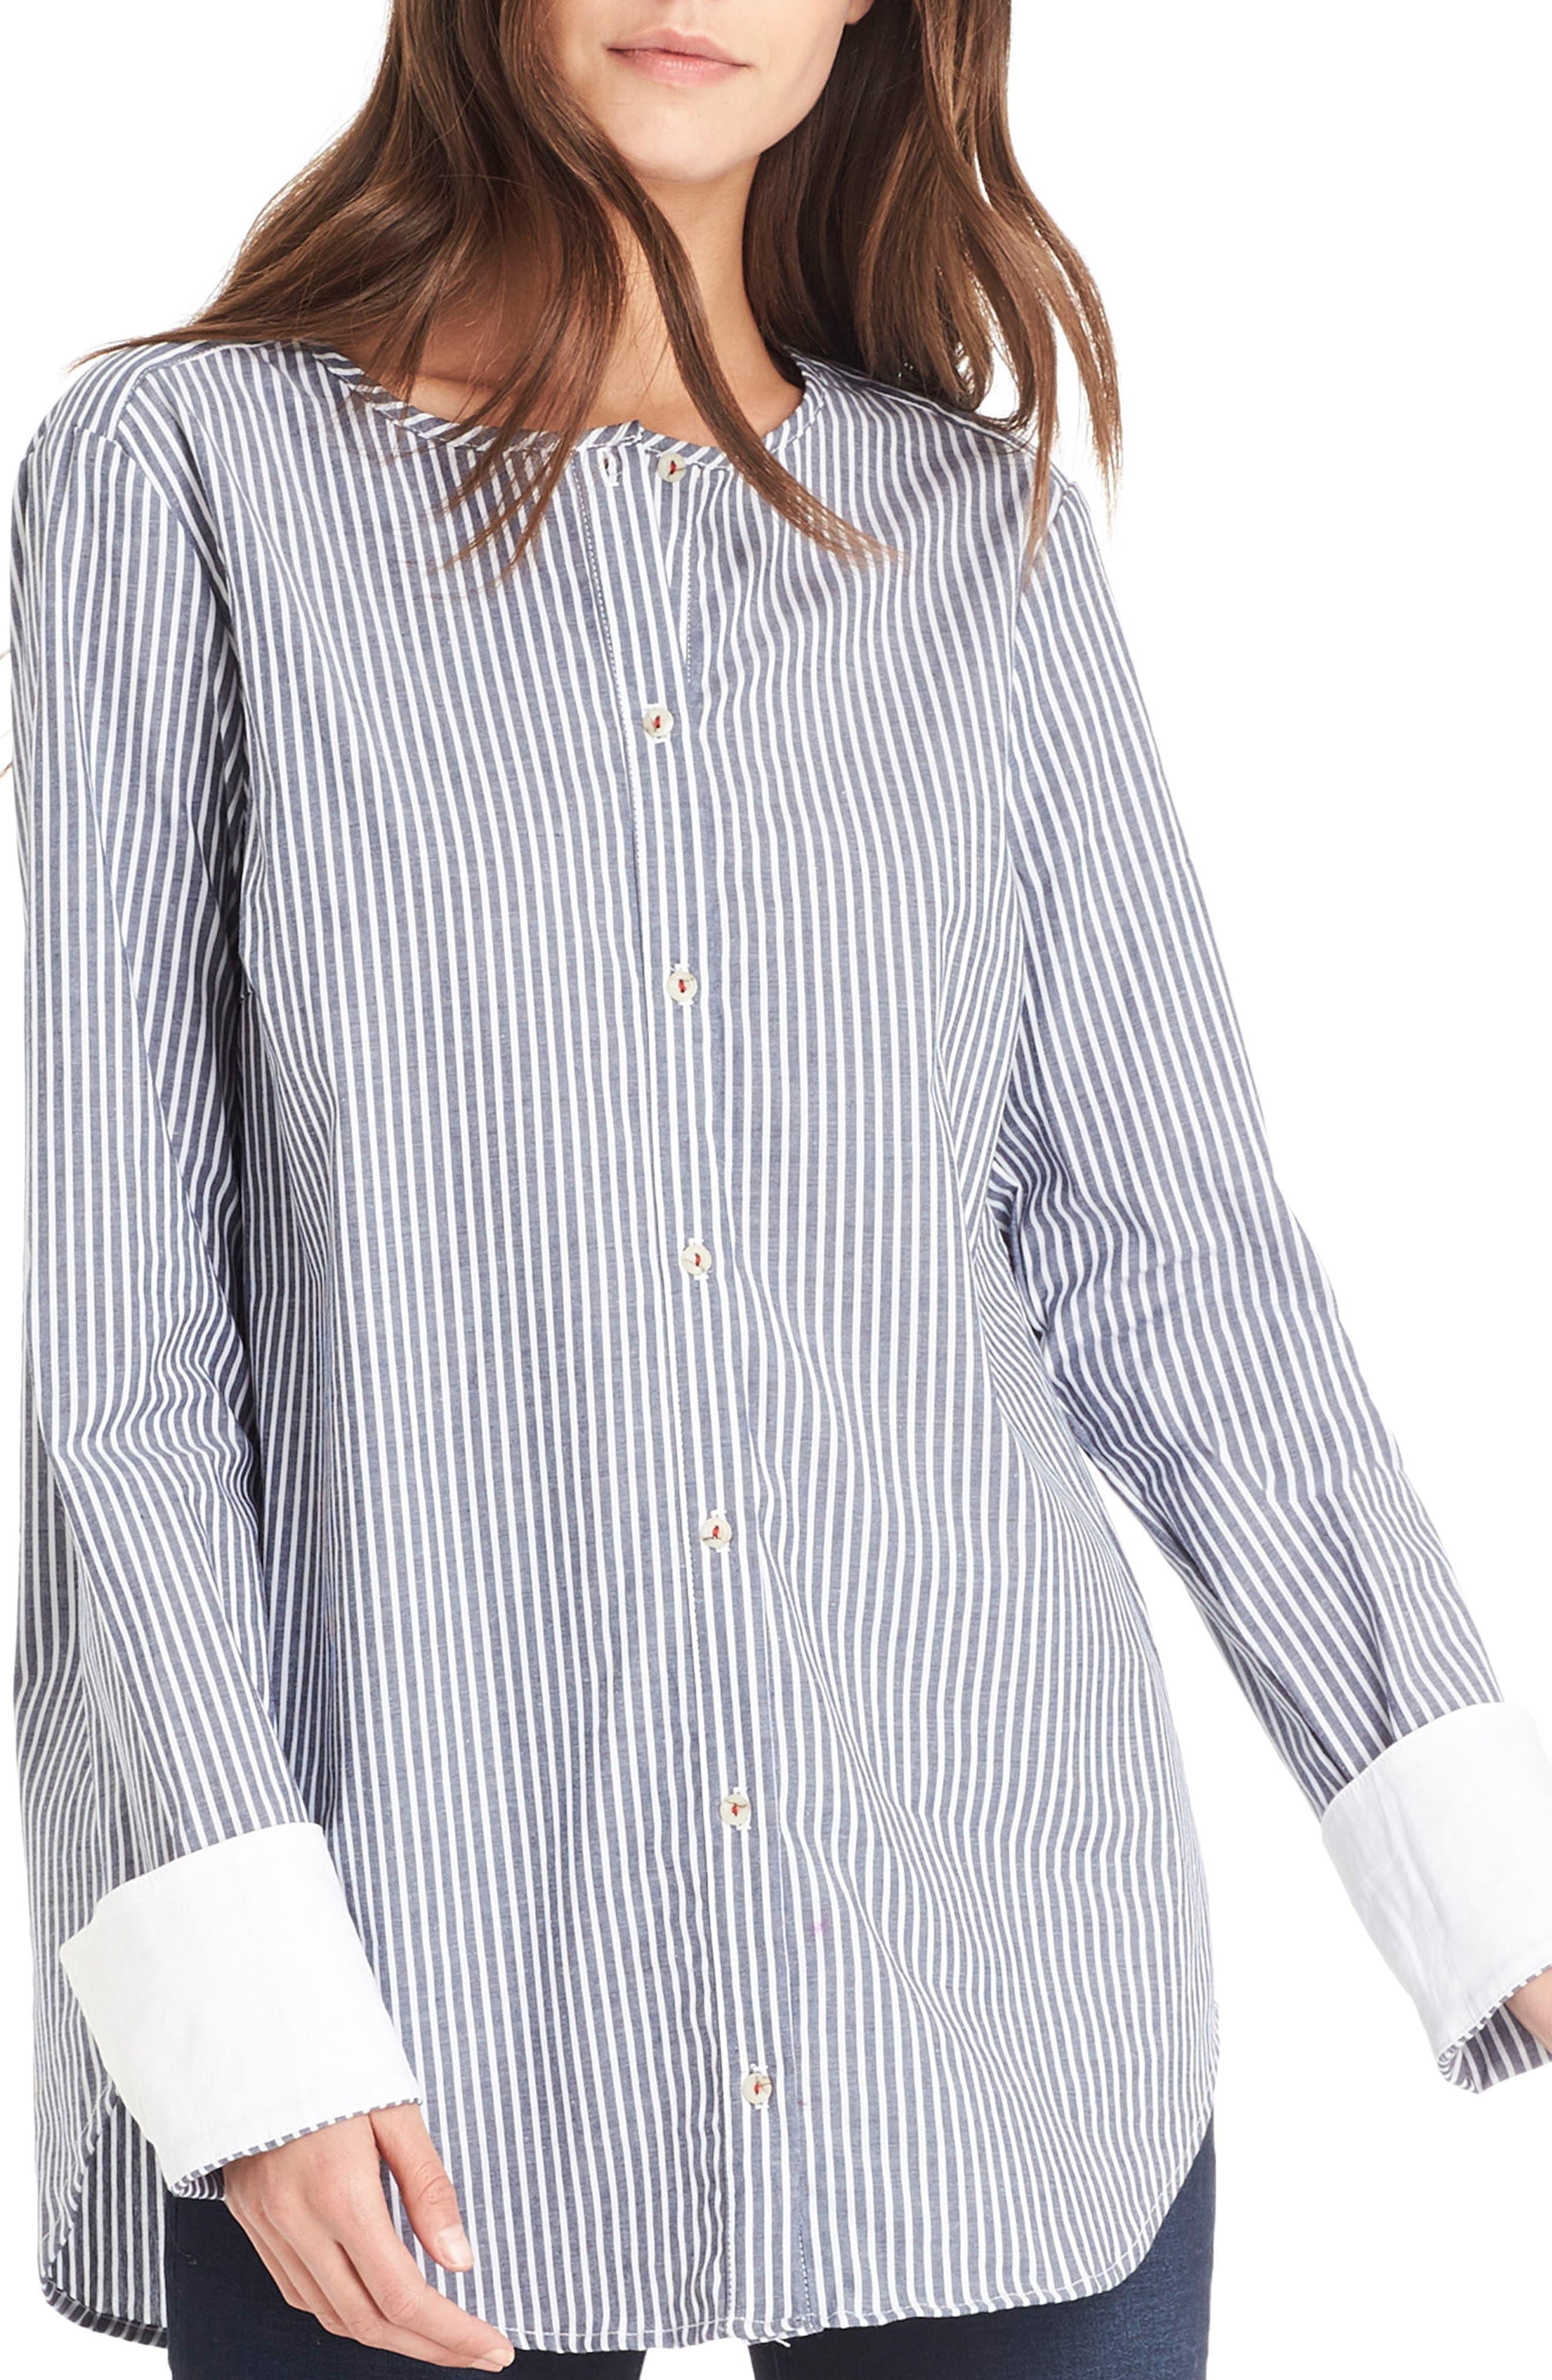 Main Image - Michael Stars Contrast Cuff Shirt